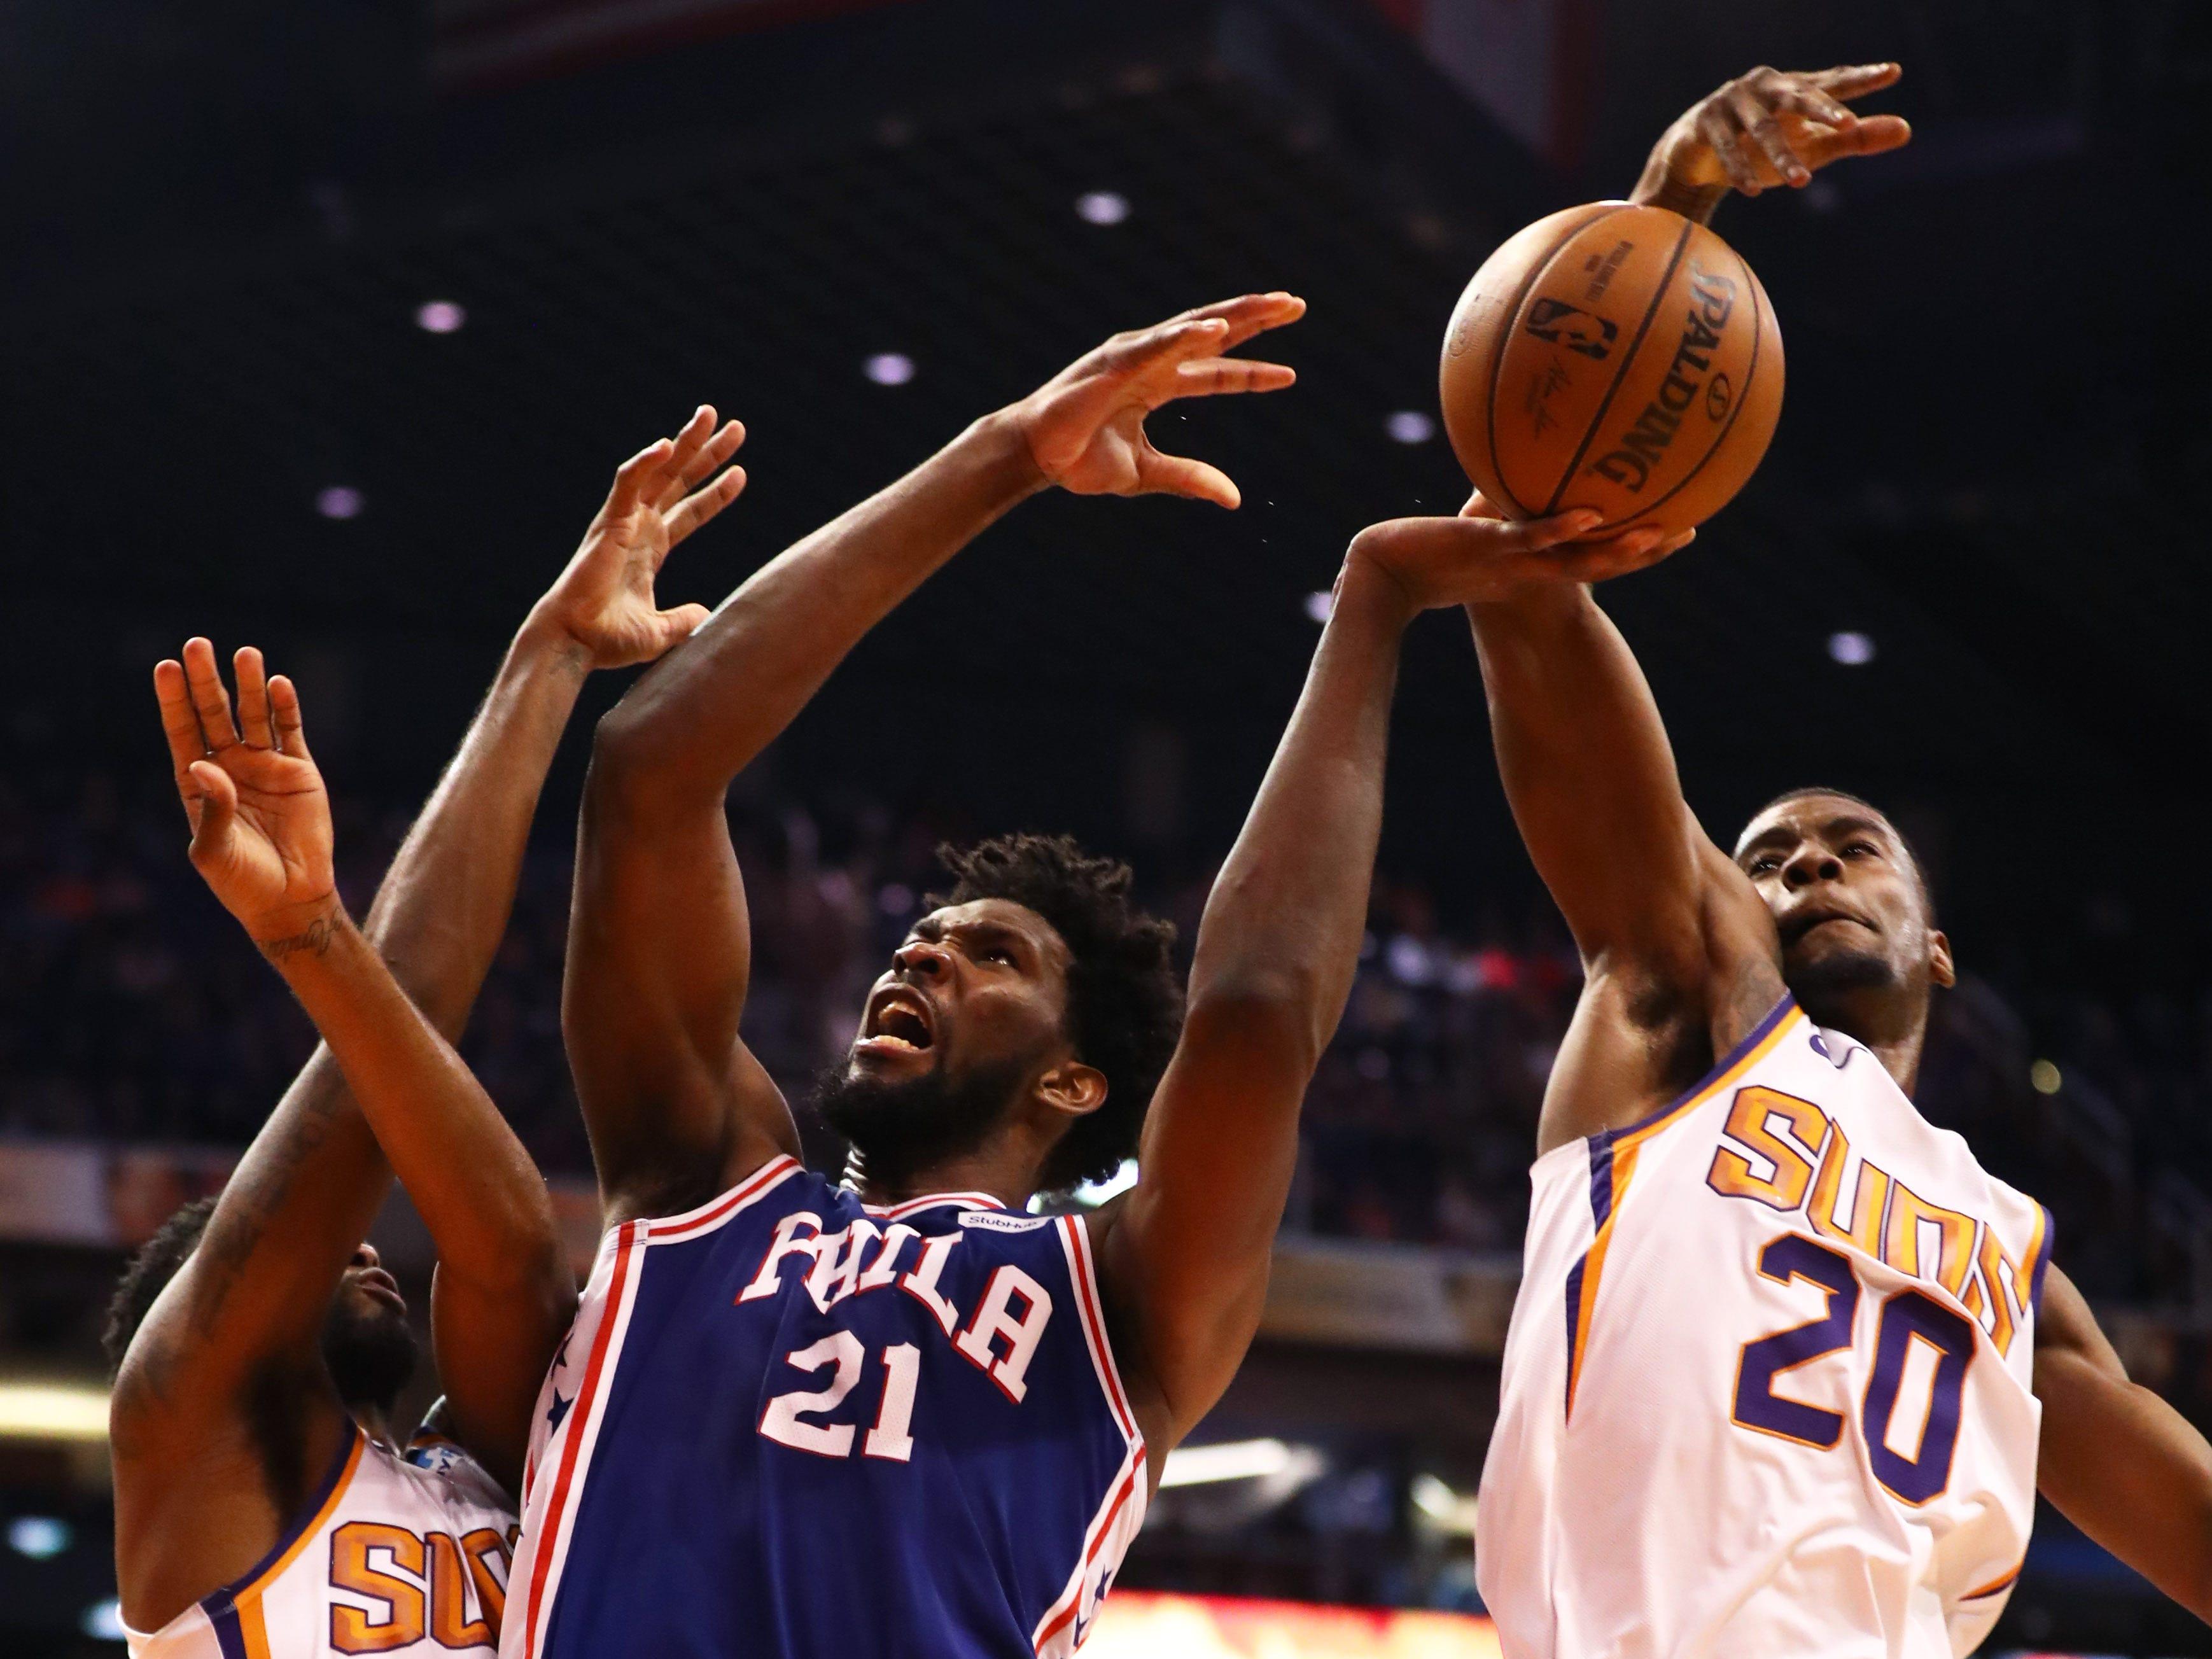 Jan 2, 2019; Phoenix, AZ, USA; Phoenix Suns forward Josh Jackson (20) blocks the shot of Philadelphia 76ers center Joel Embiid (21) in the second half at Talking Stick Resort Arena. Mandatory Credit: Mark J. Rebilas-USA TODAY Sports